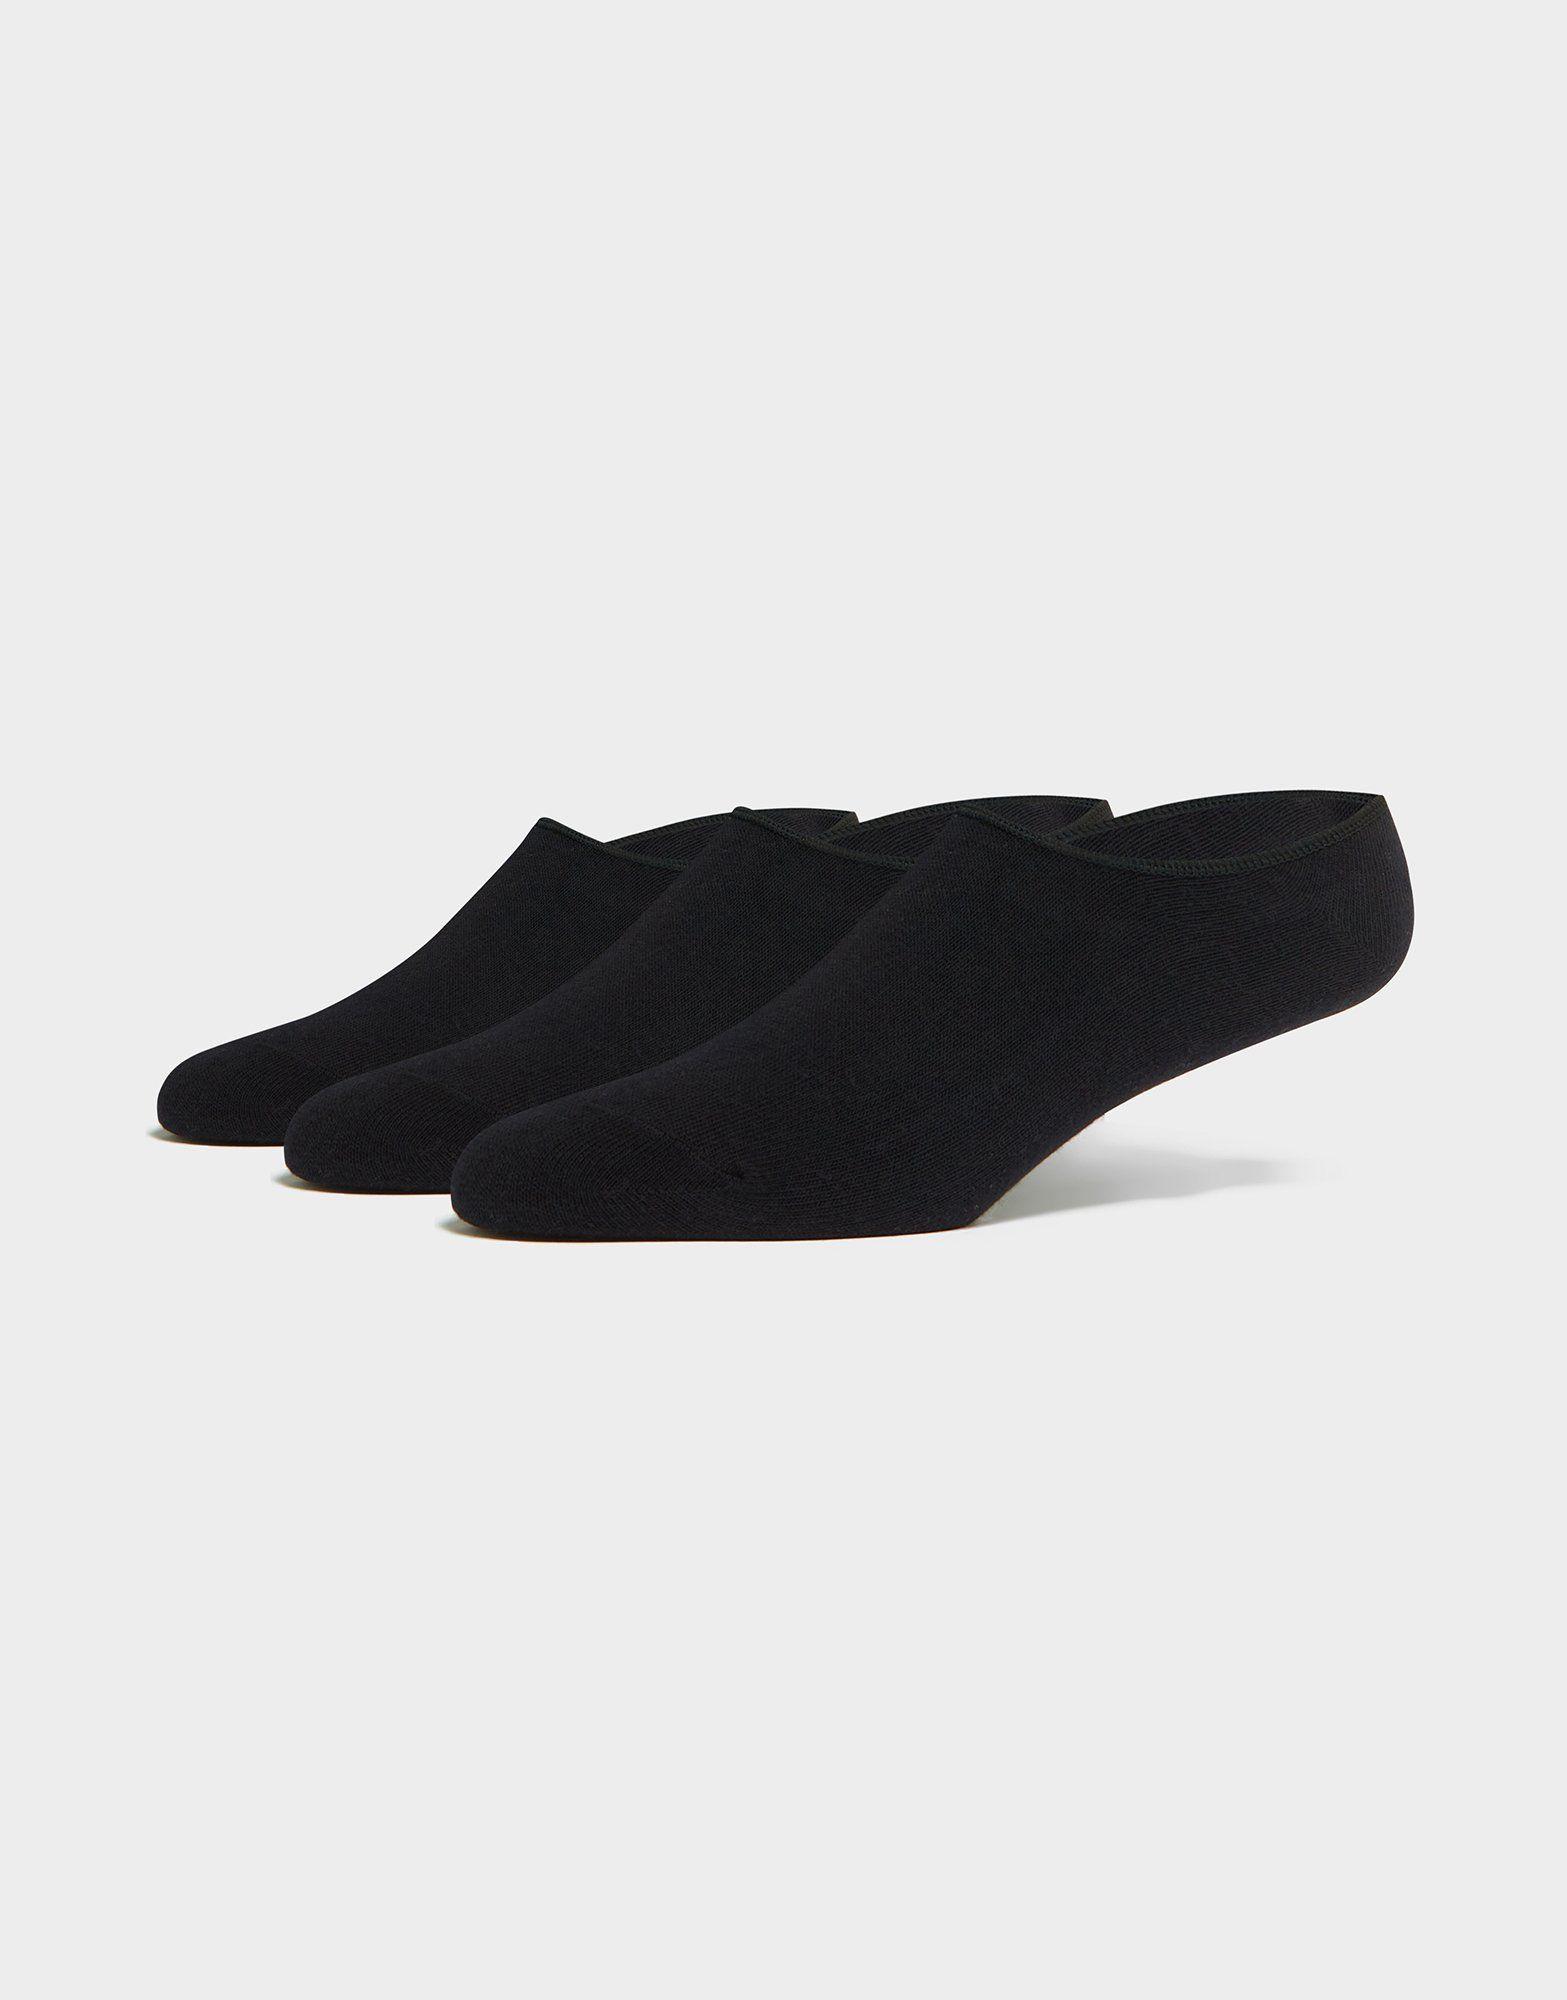 47e278333cb McKenzie 3 Pack Invisible Socks ...